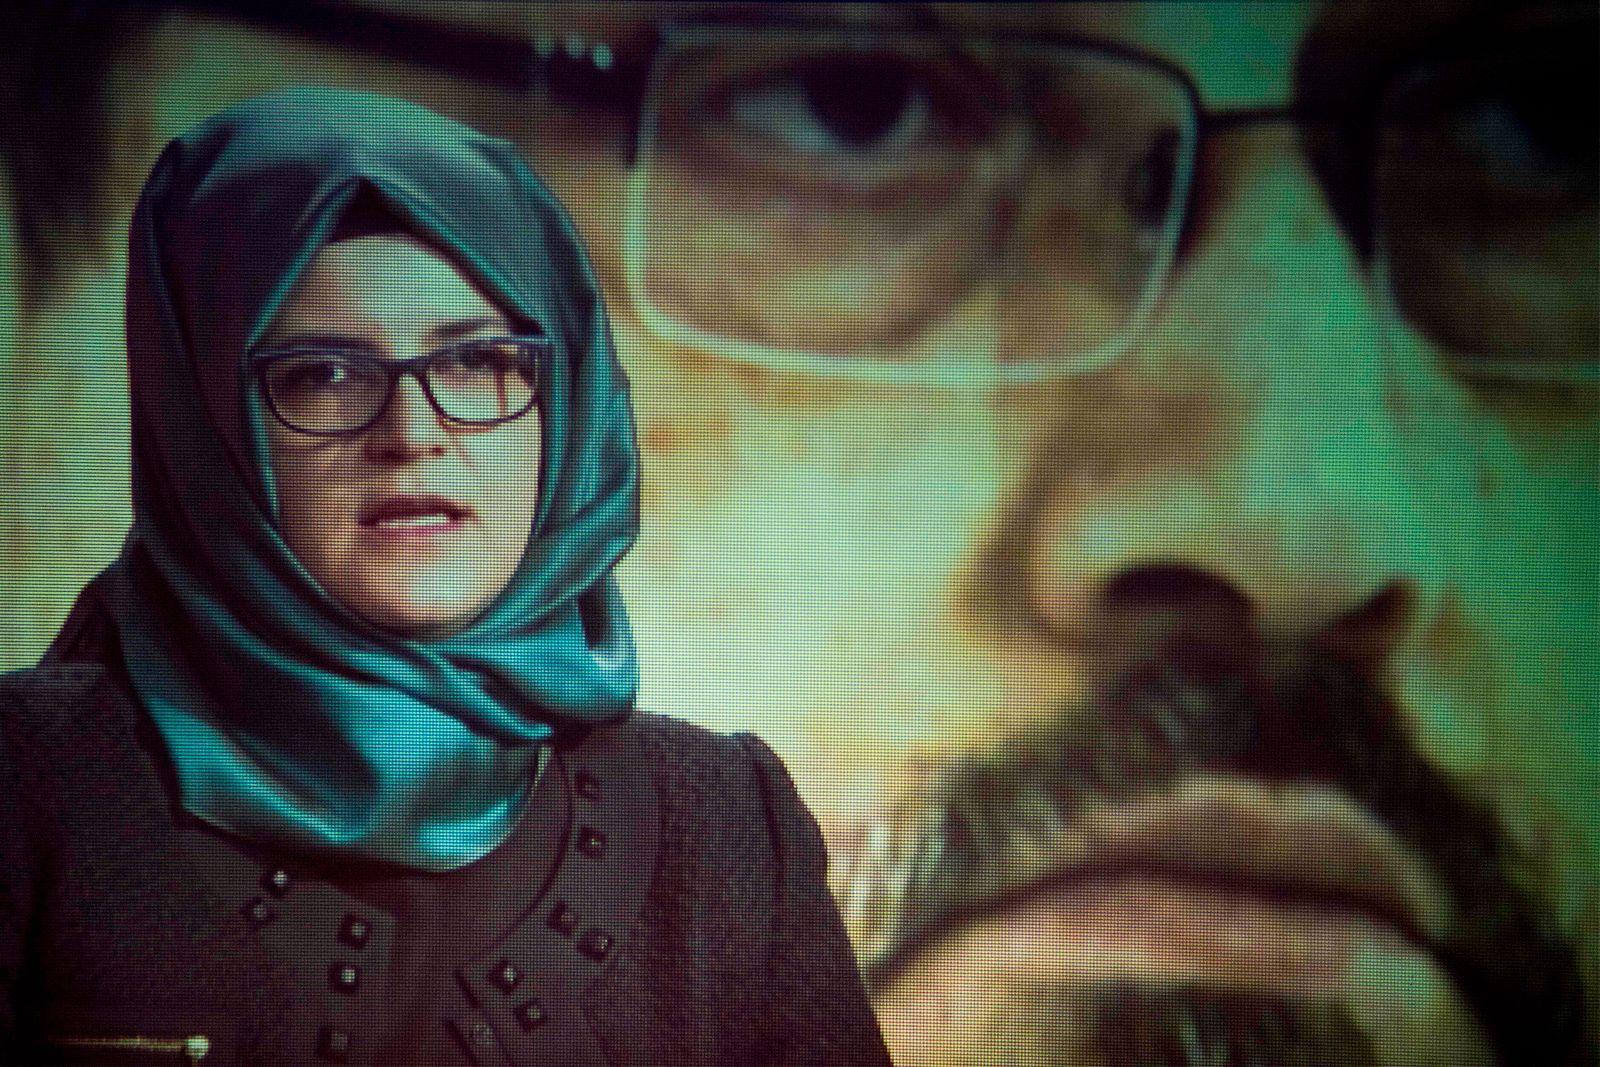 Memorial service for murdered Saudi journalist Jamal Khashoggi, including video address by his widow